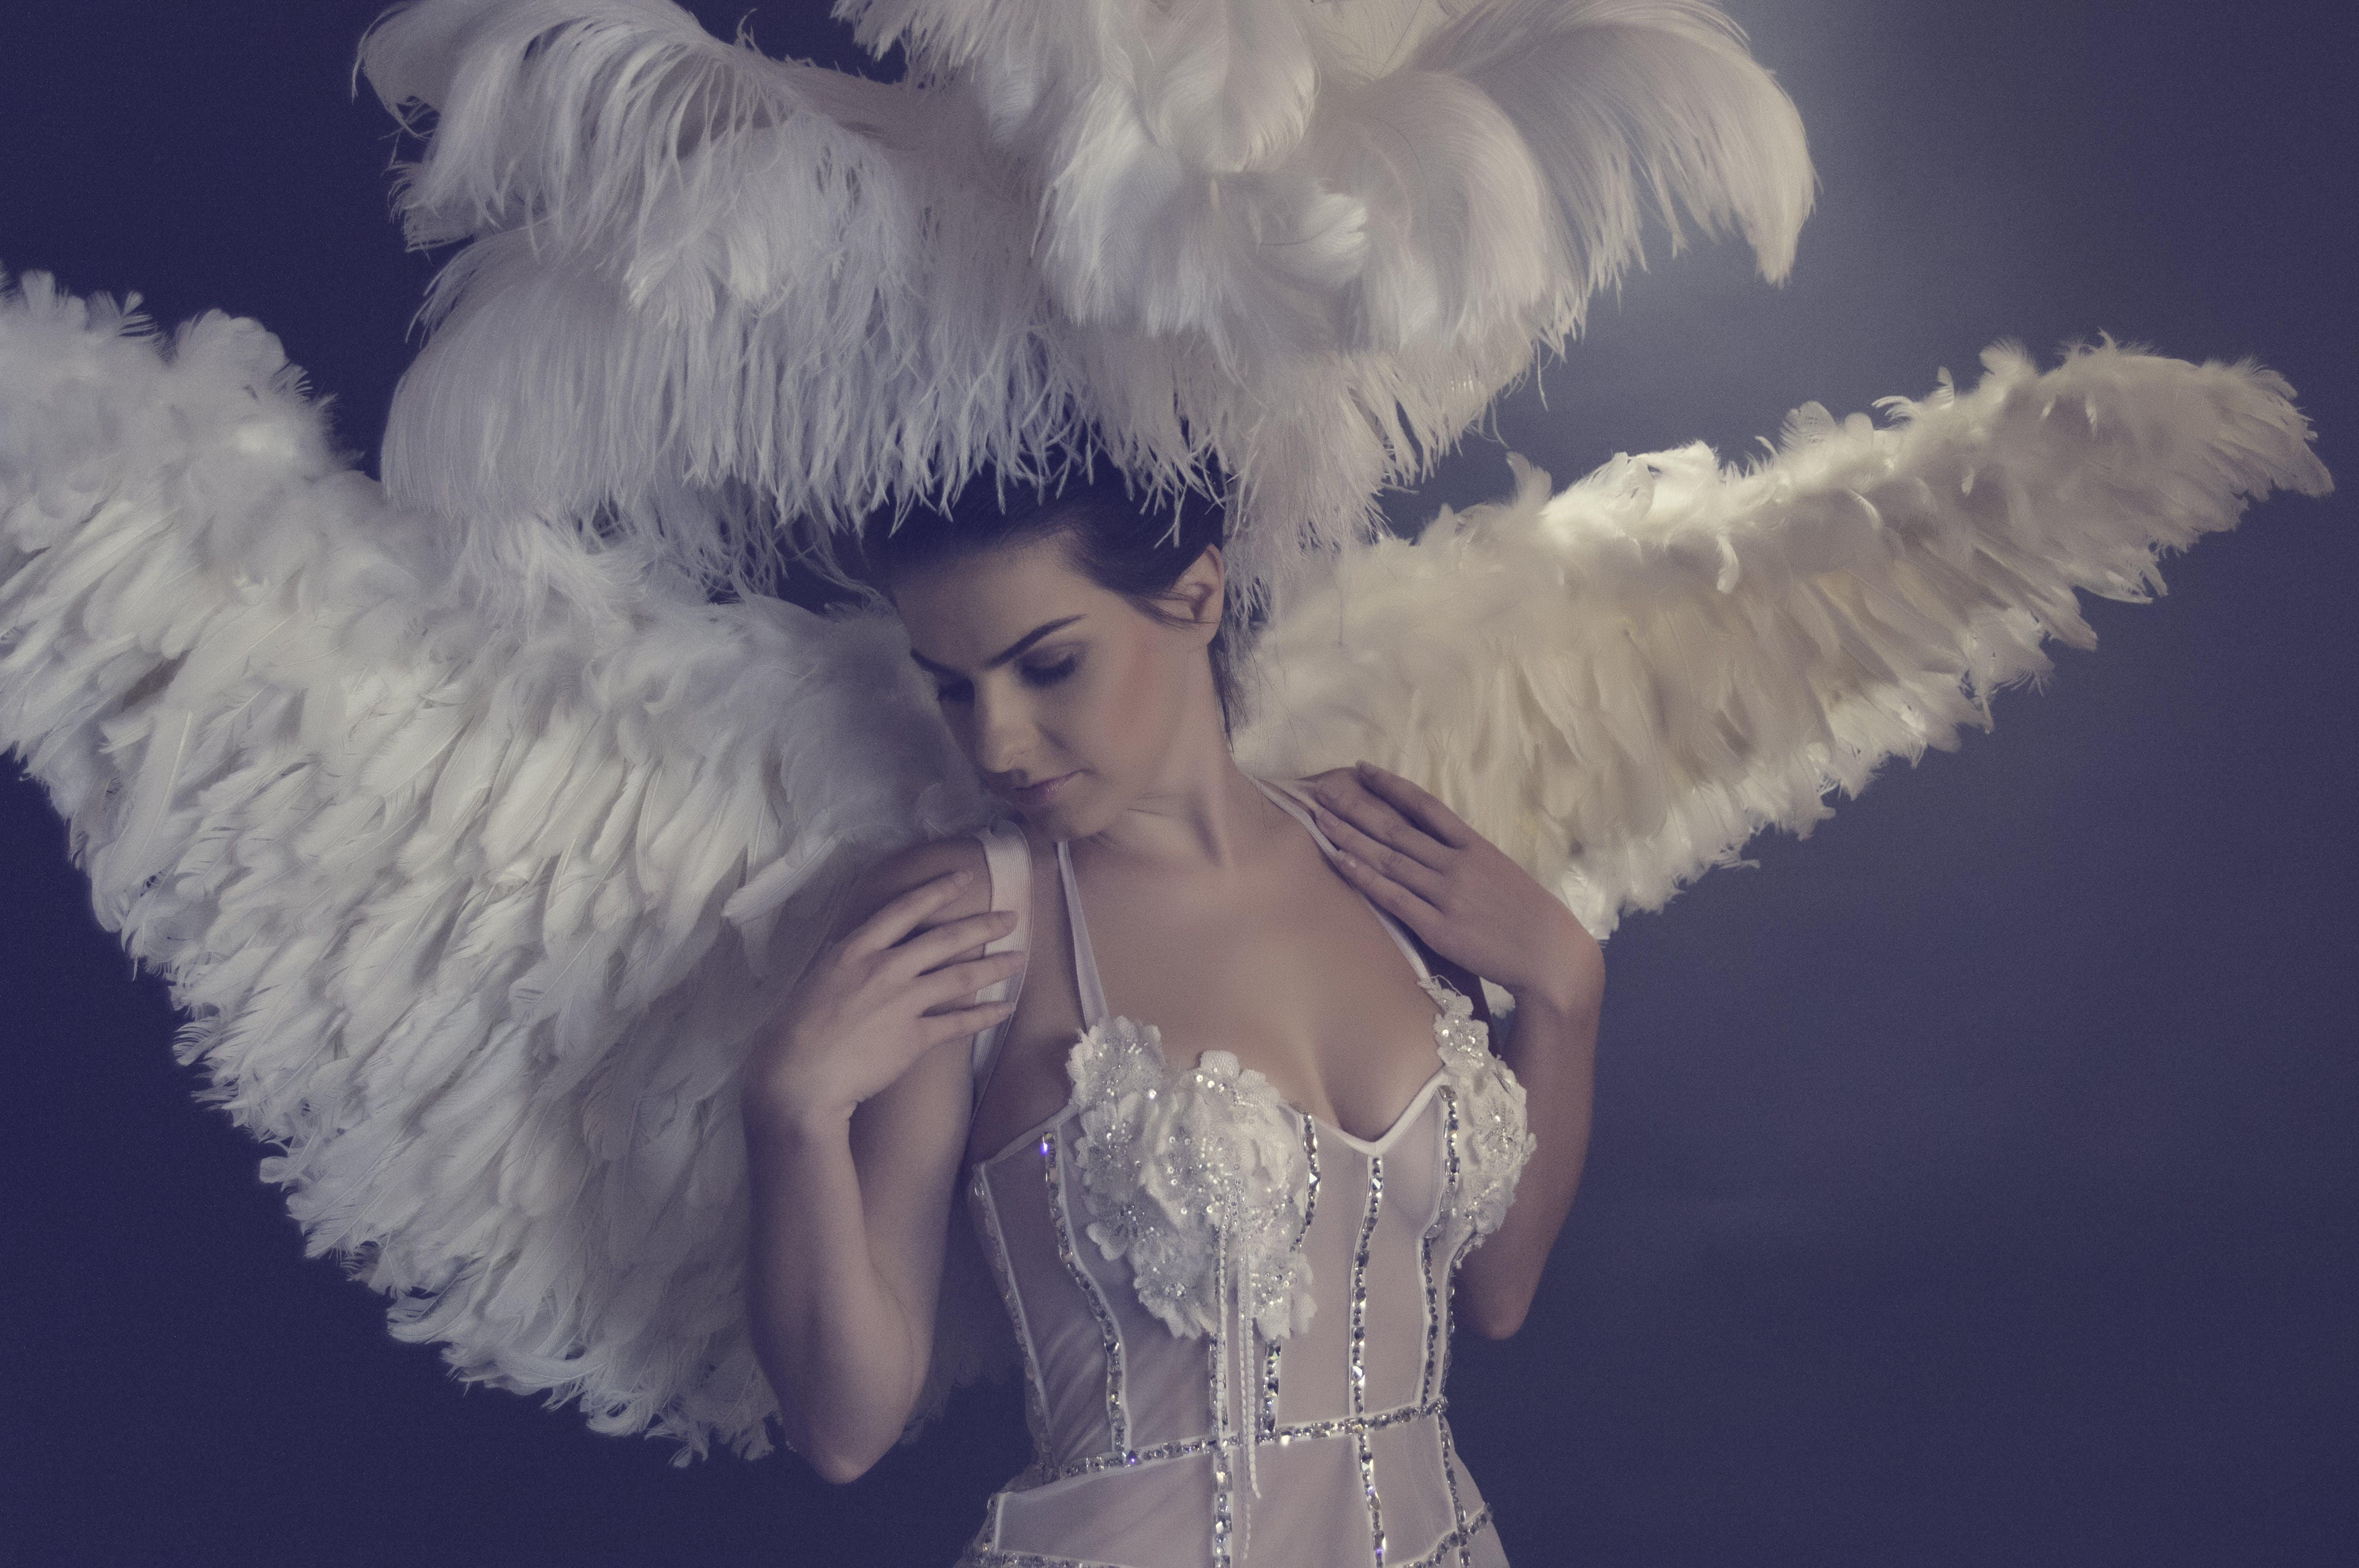 Woman Wearing White Angel Costume